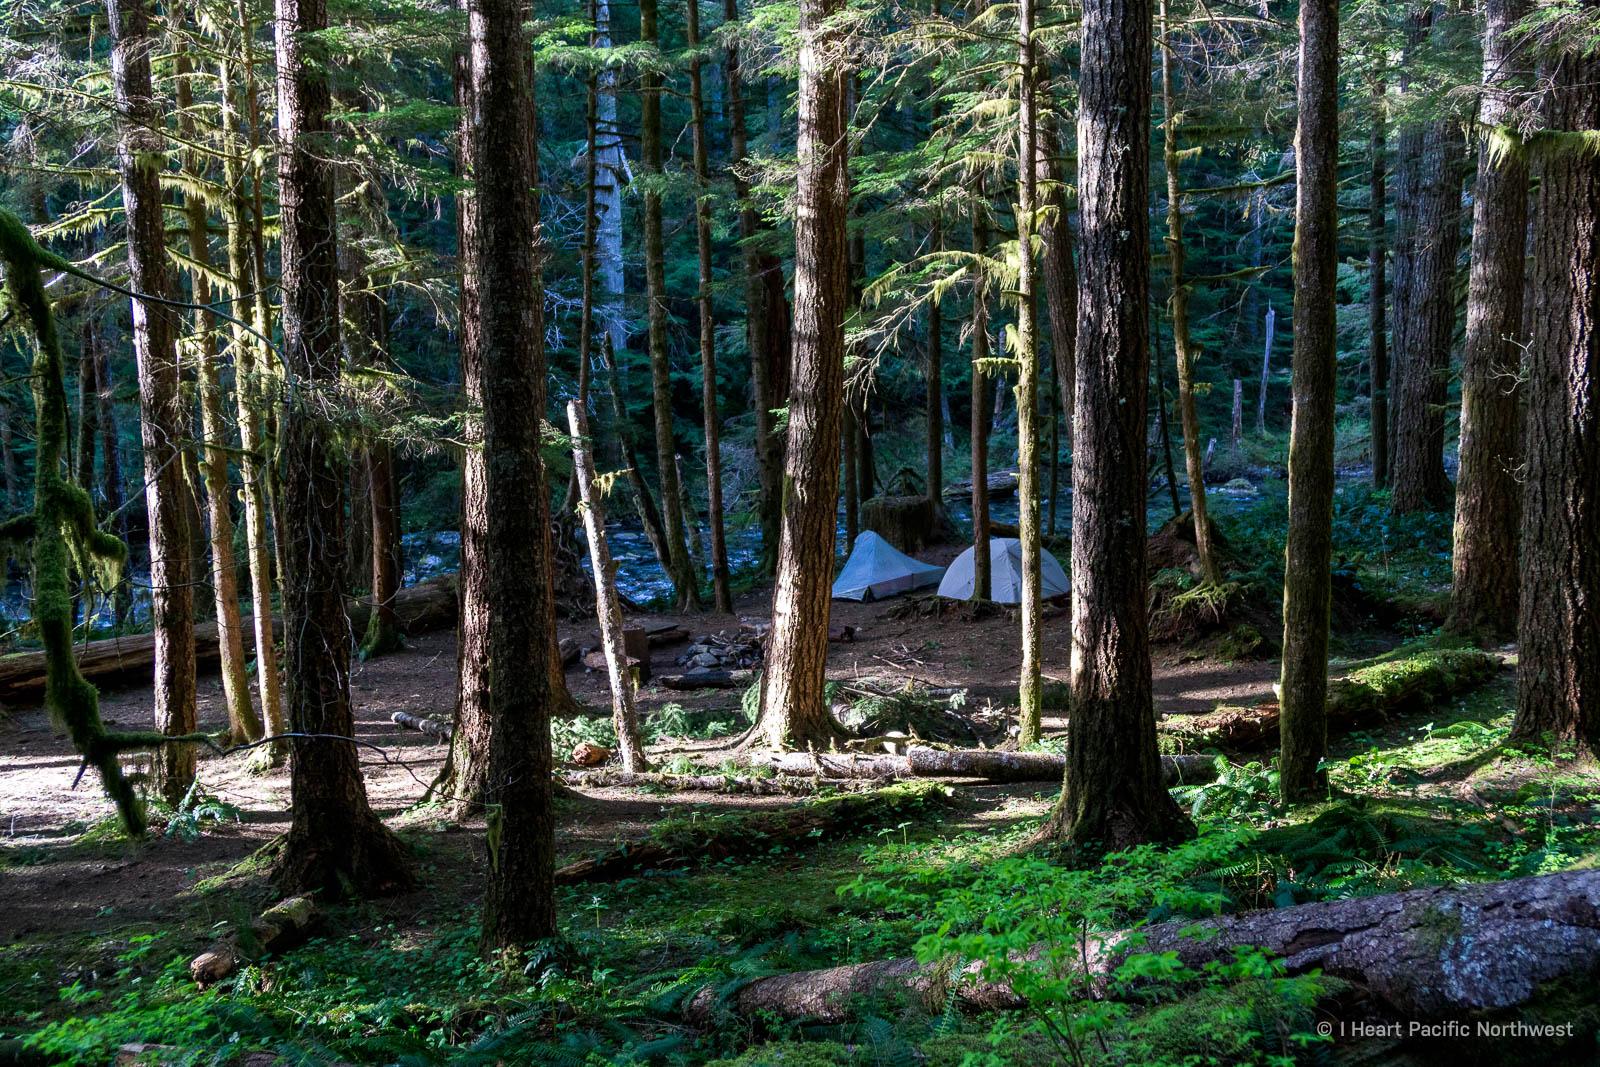 Siouxon Creek backpacking trip